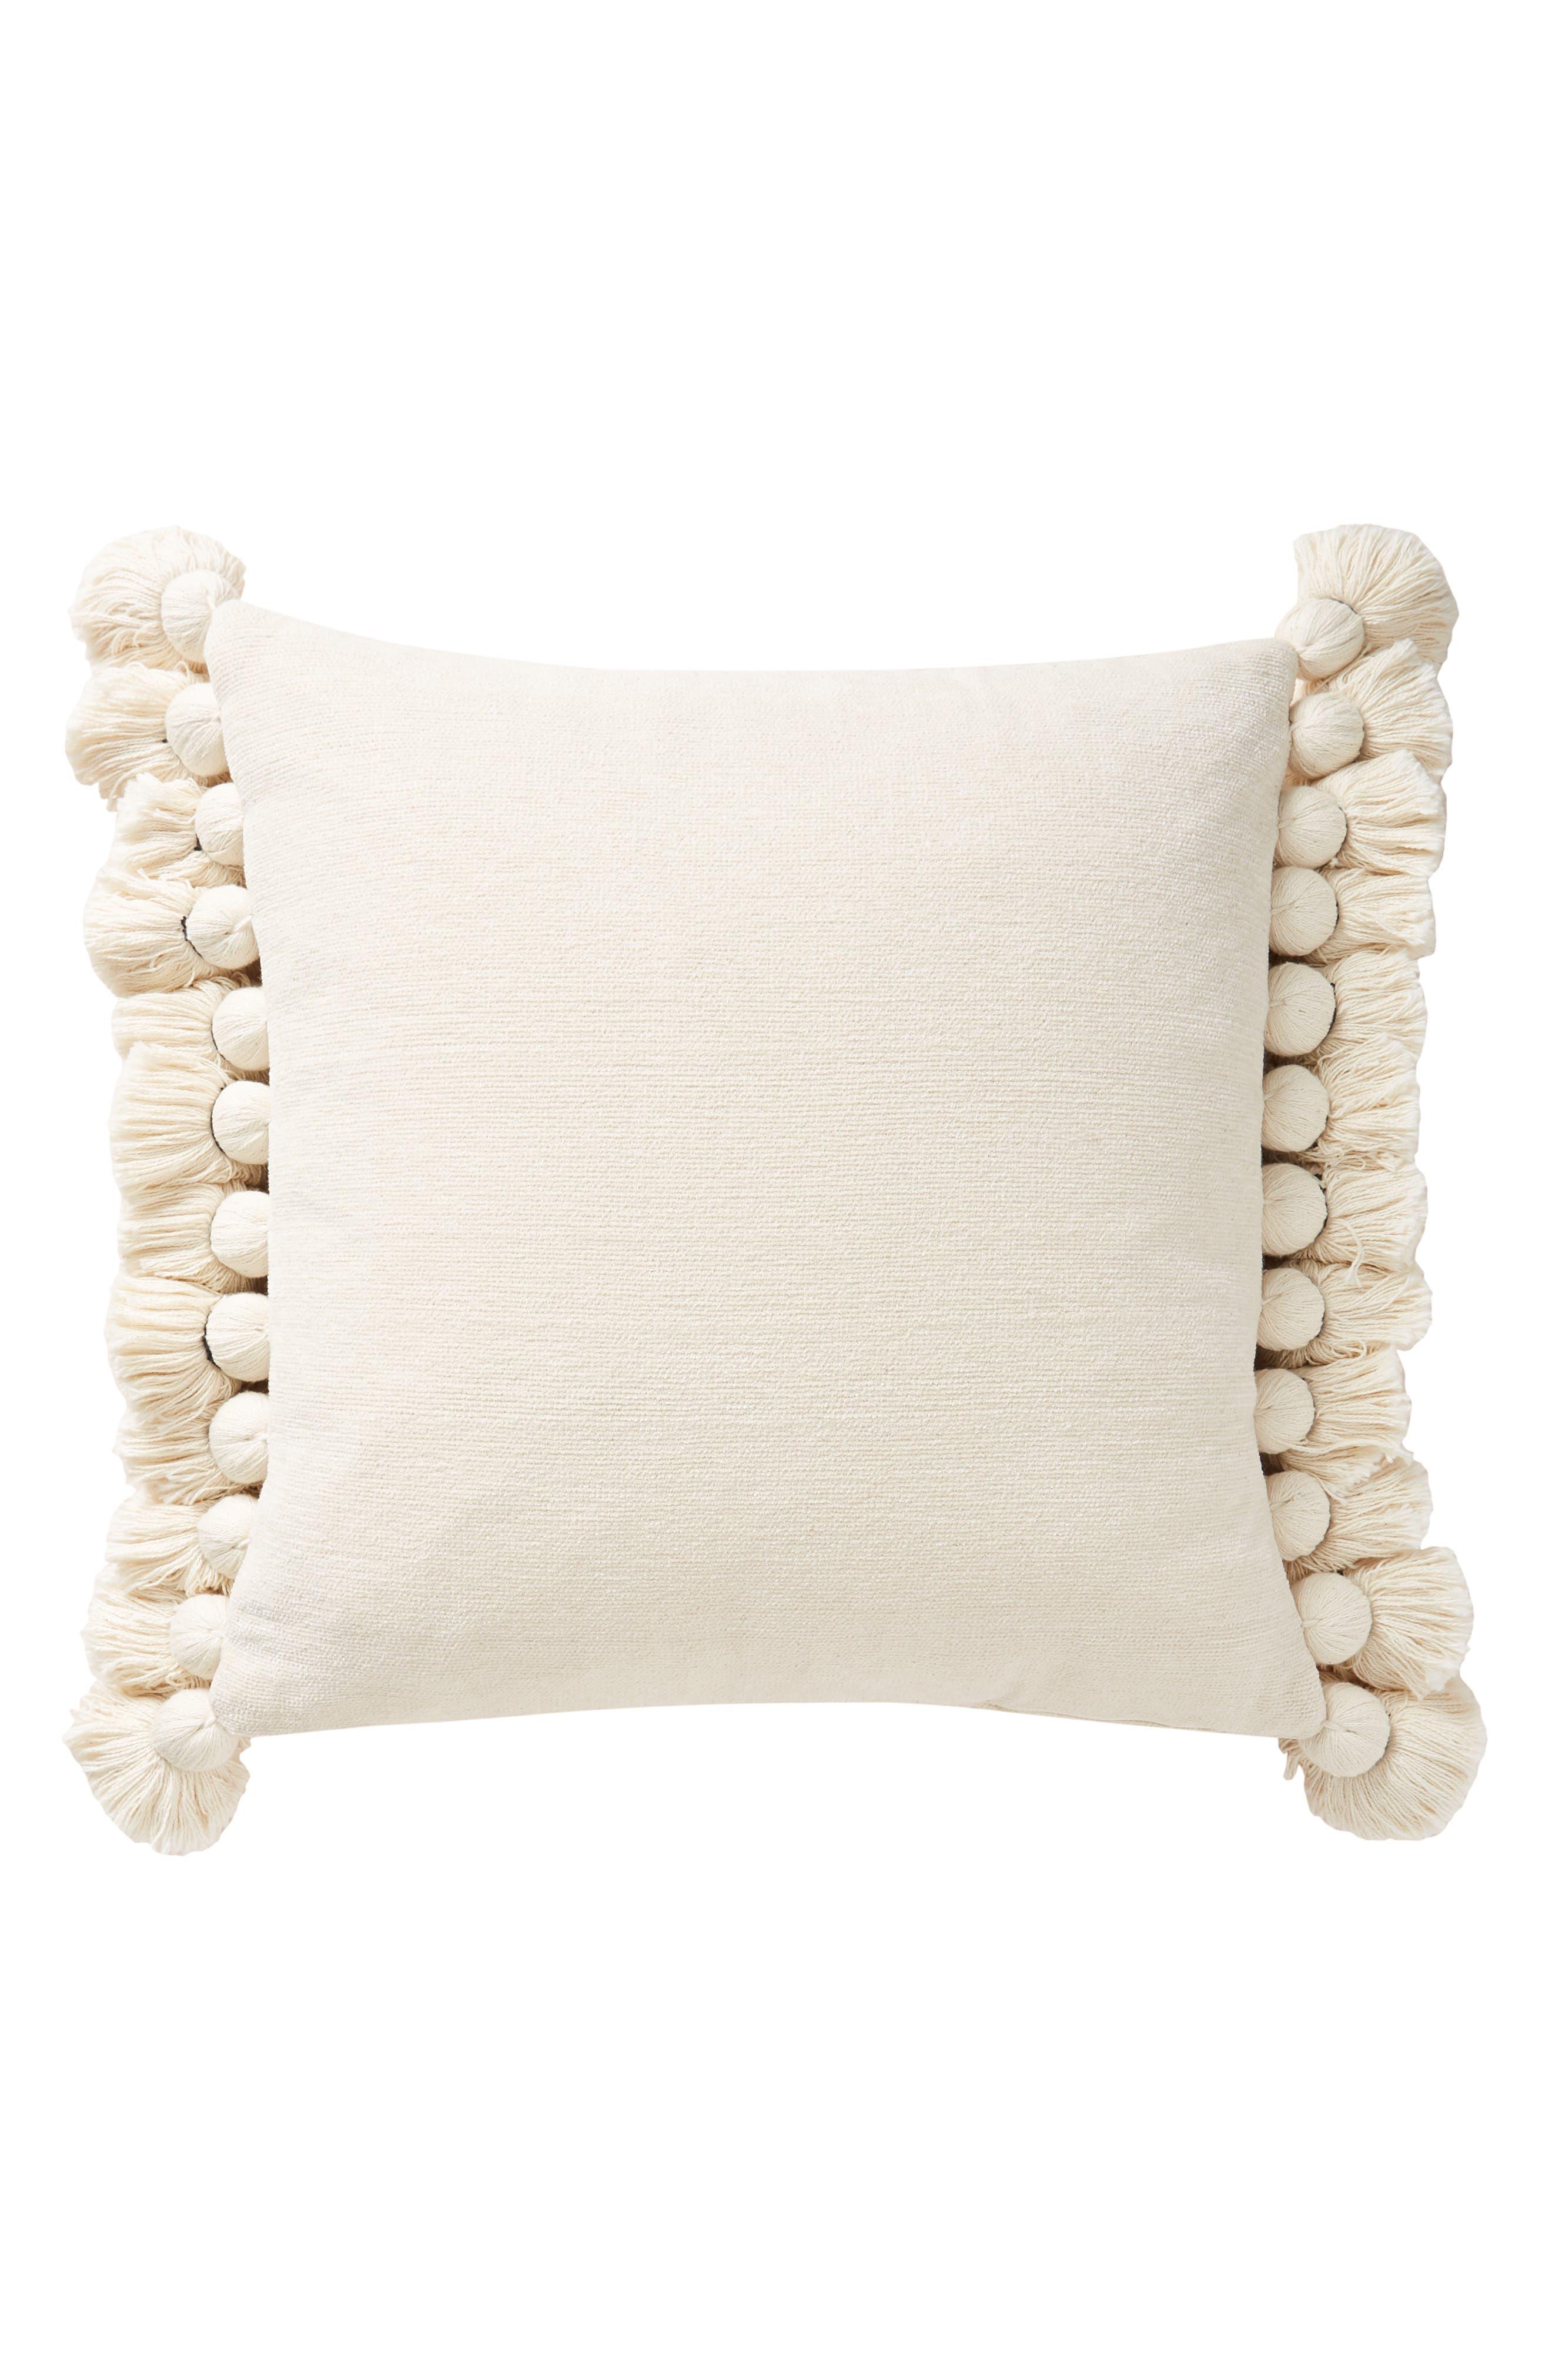 Nadia Accent Pillow,                             Alternate thumbnail 5, color,                             250